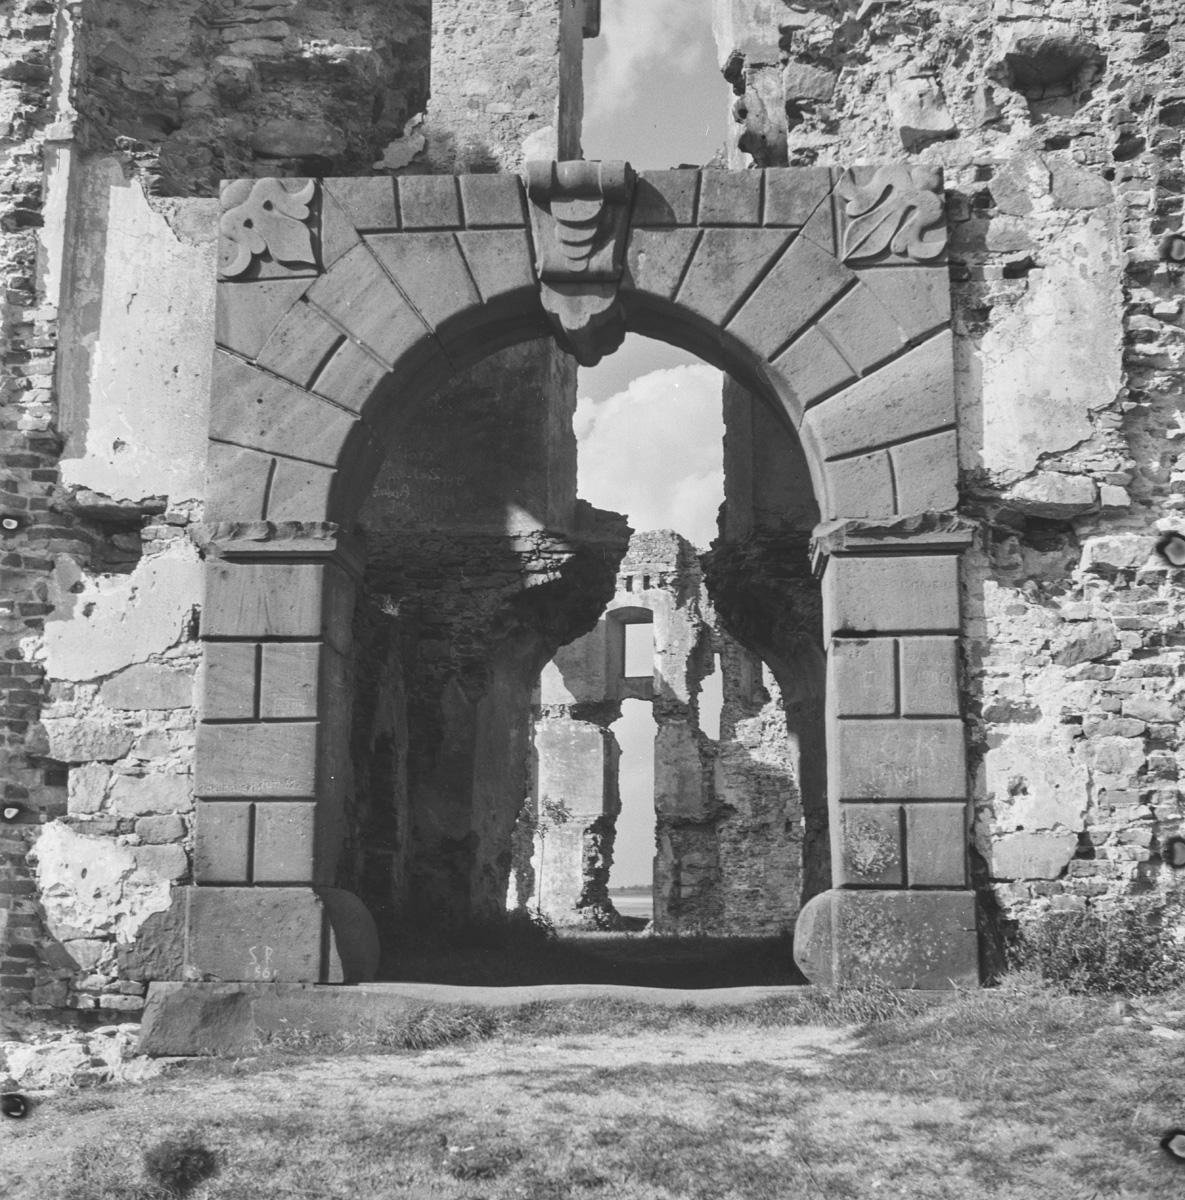 Portal w zamku